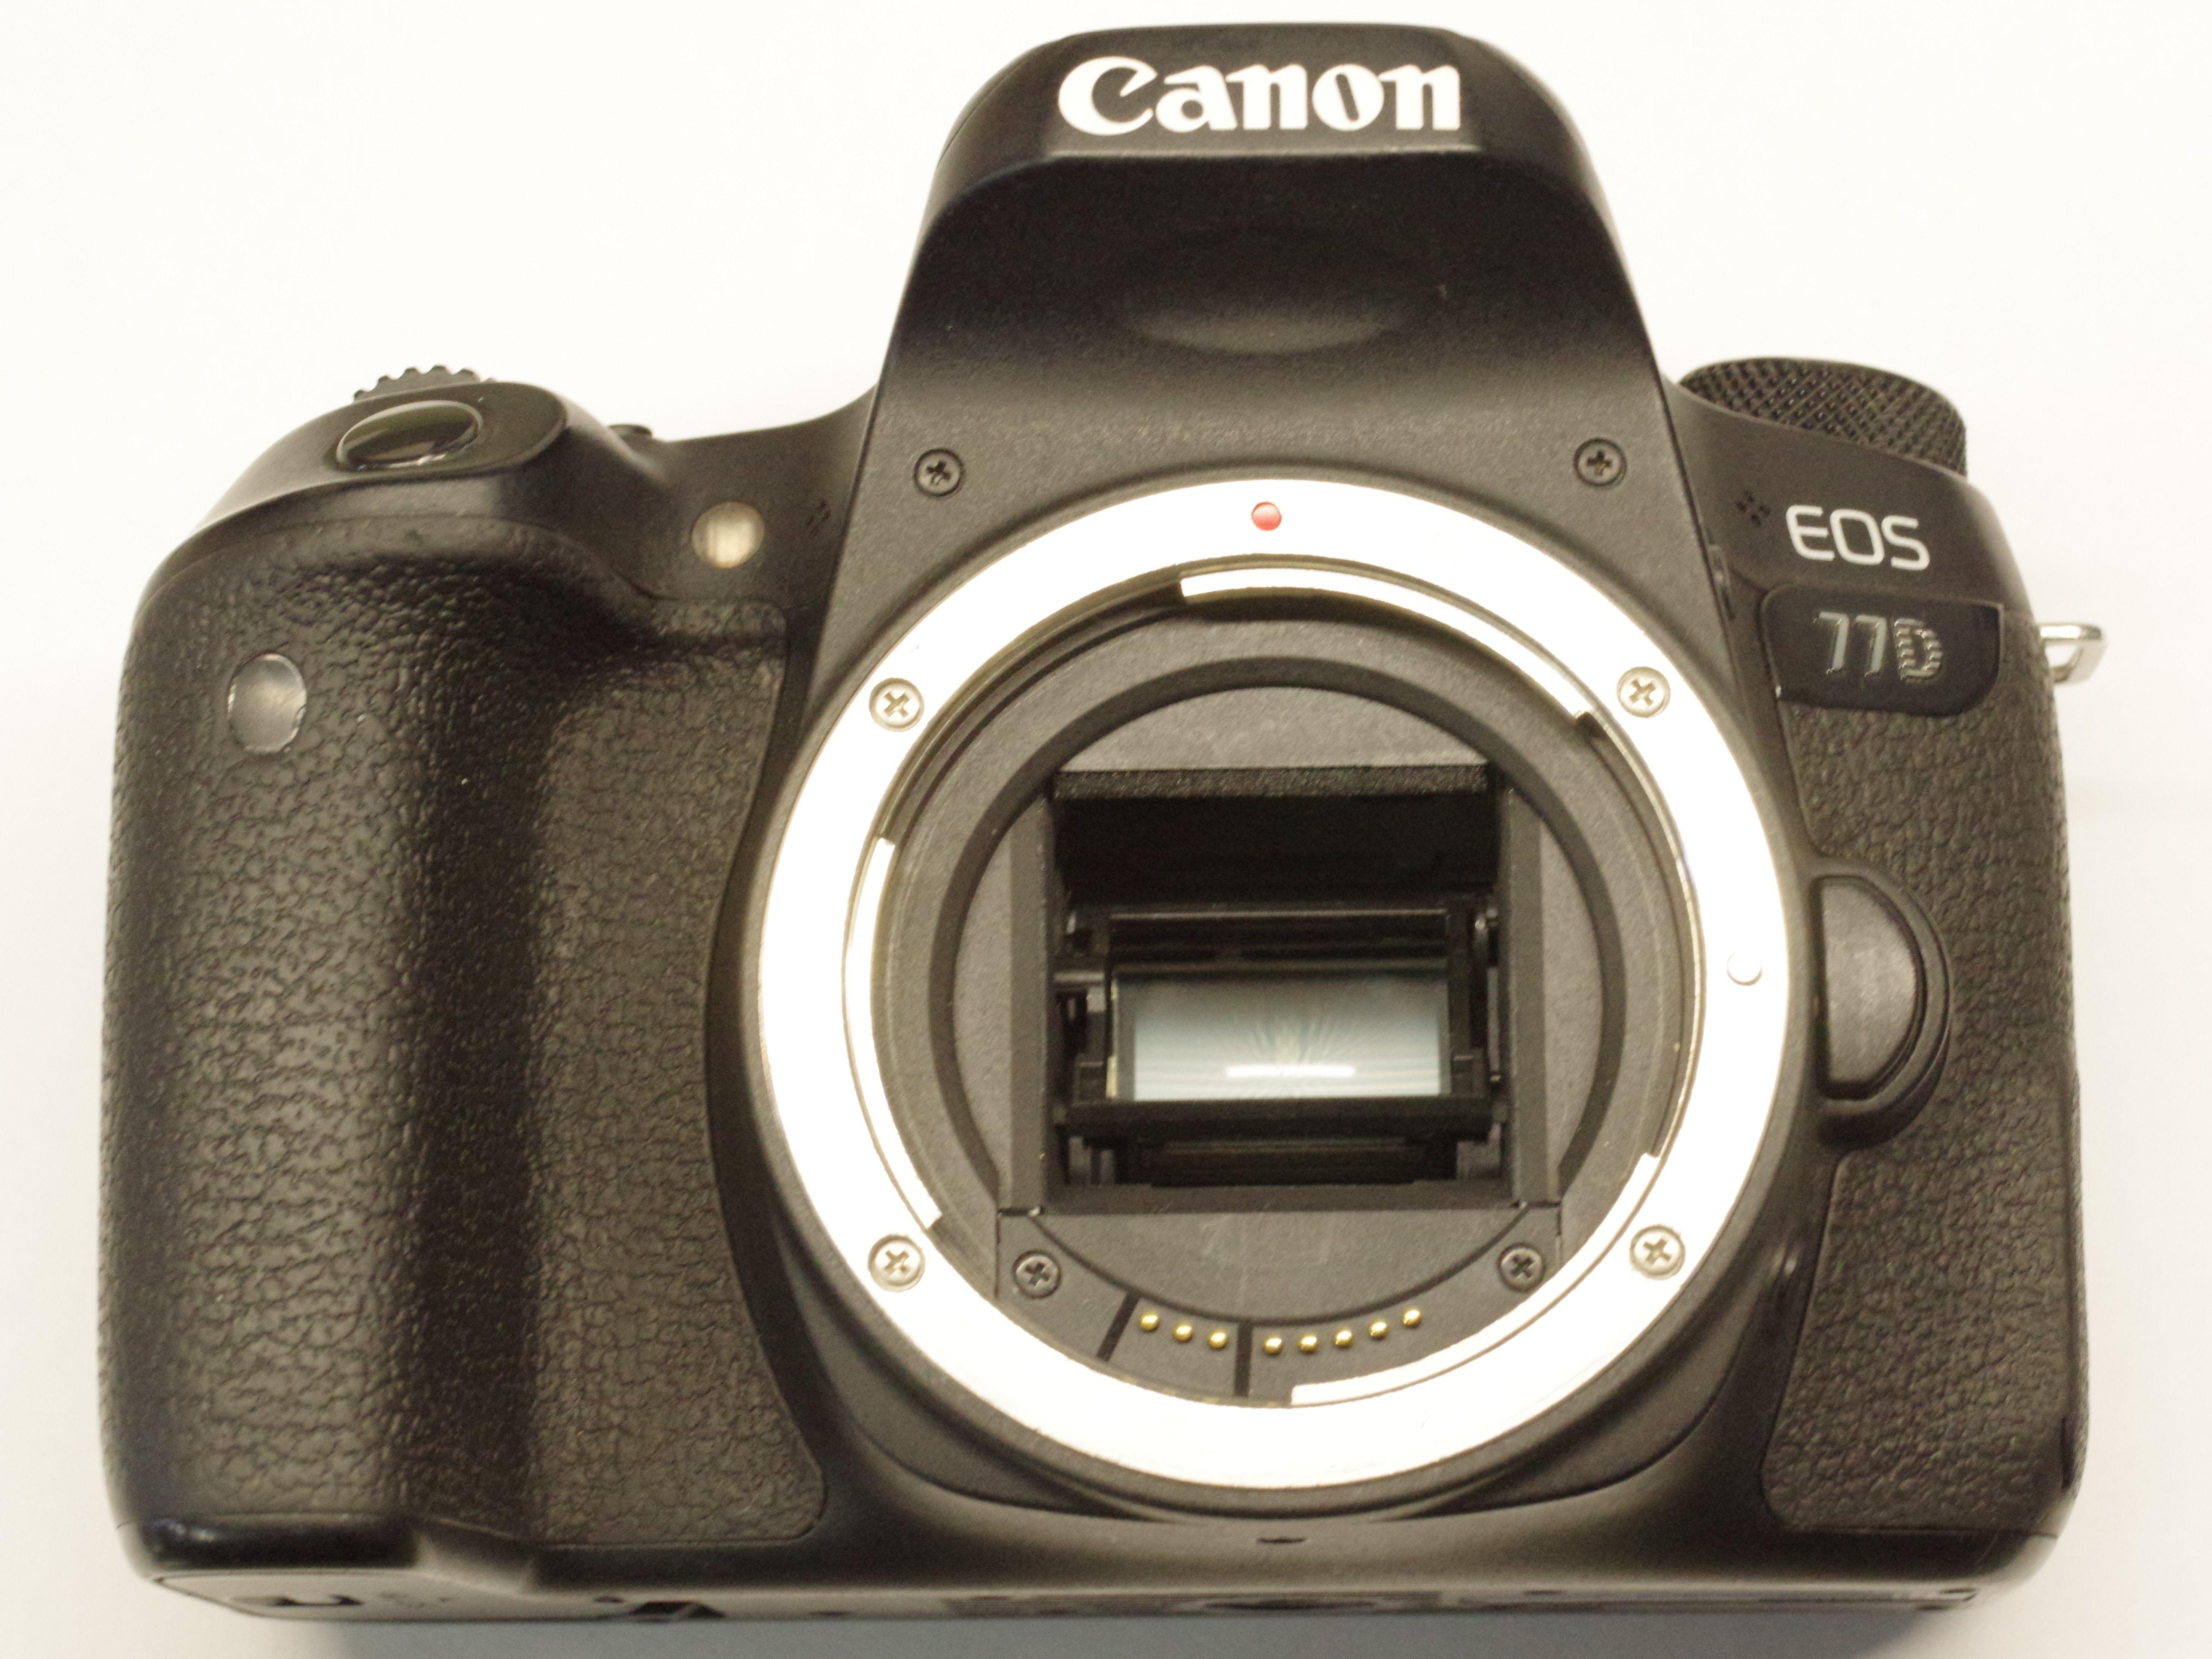 CANON EOS 77D + EF-S 18-55MM IS II